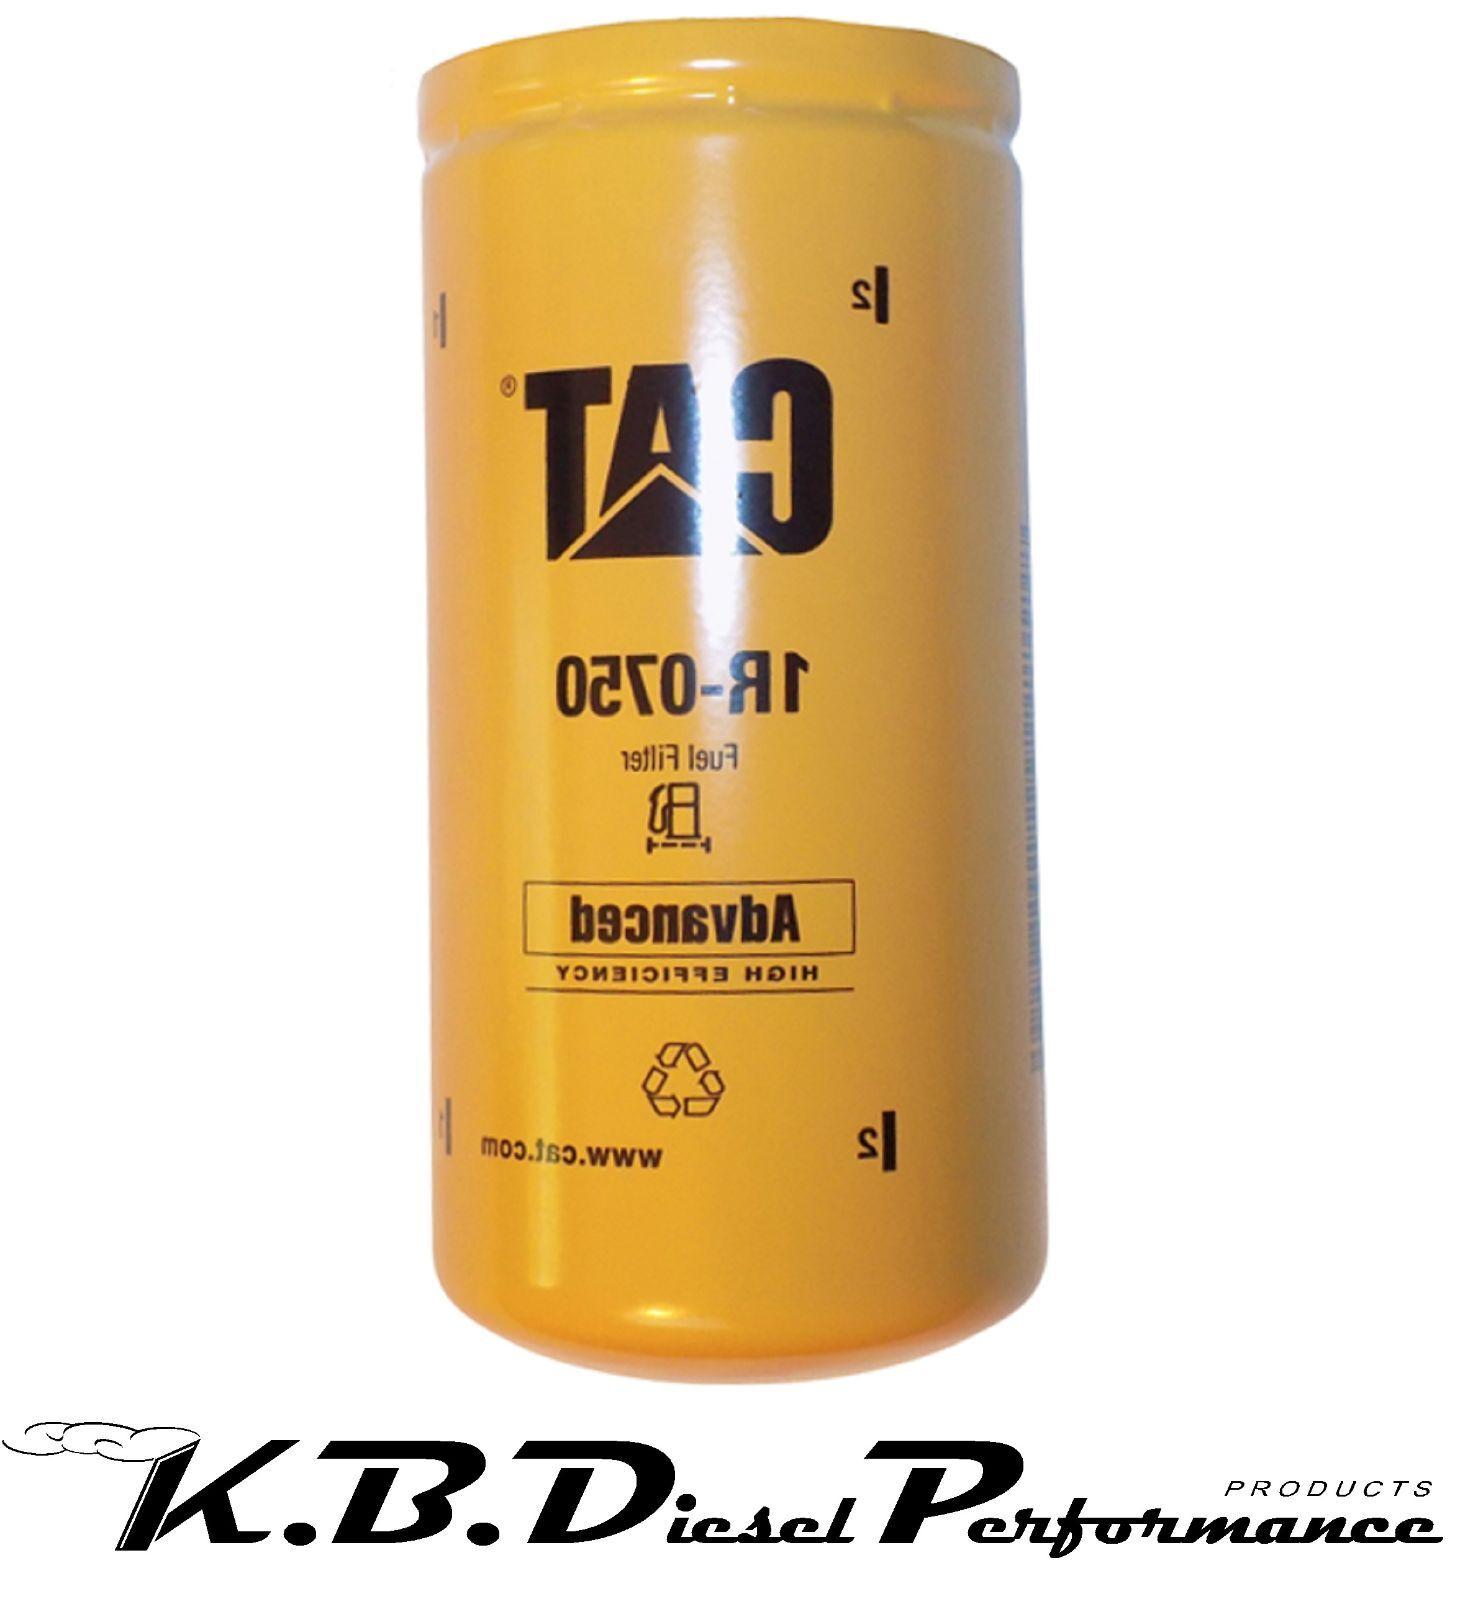 Cat Caterpillar 1r 0750 2 Micron Fuel Filter Duramax 66l Lb7 Lly 03 Housing Lbz Lmm Lml Item Number 291520591722